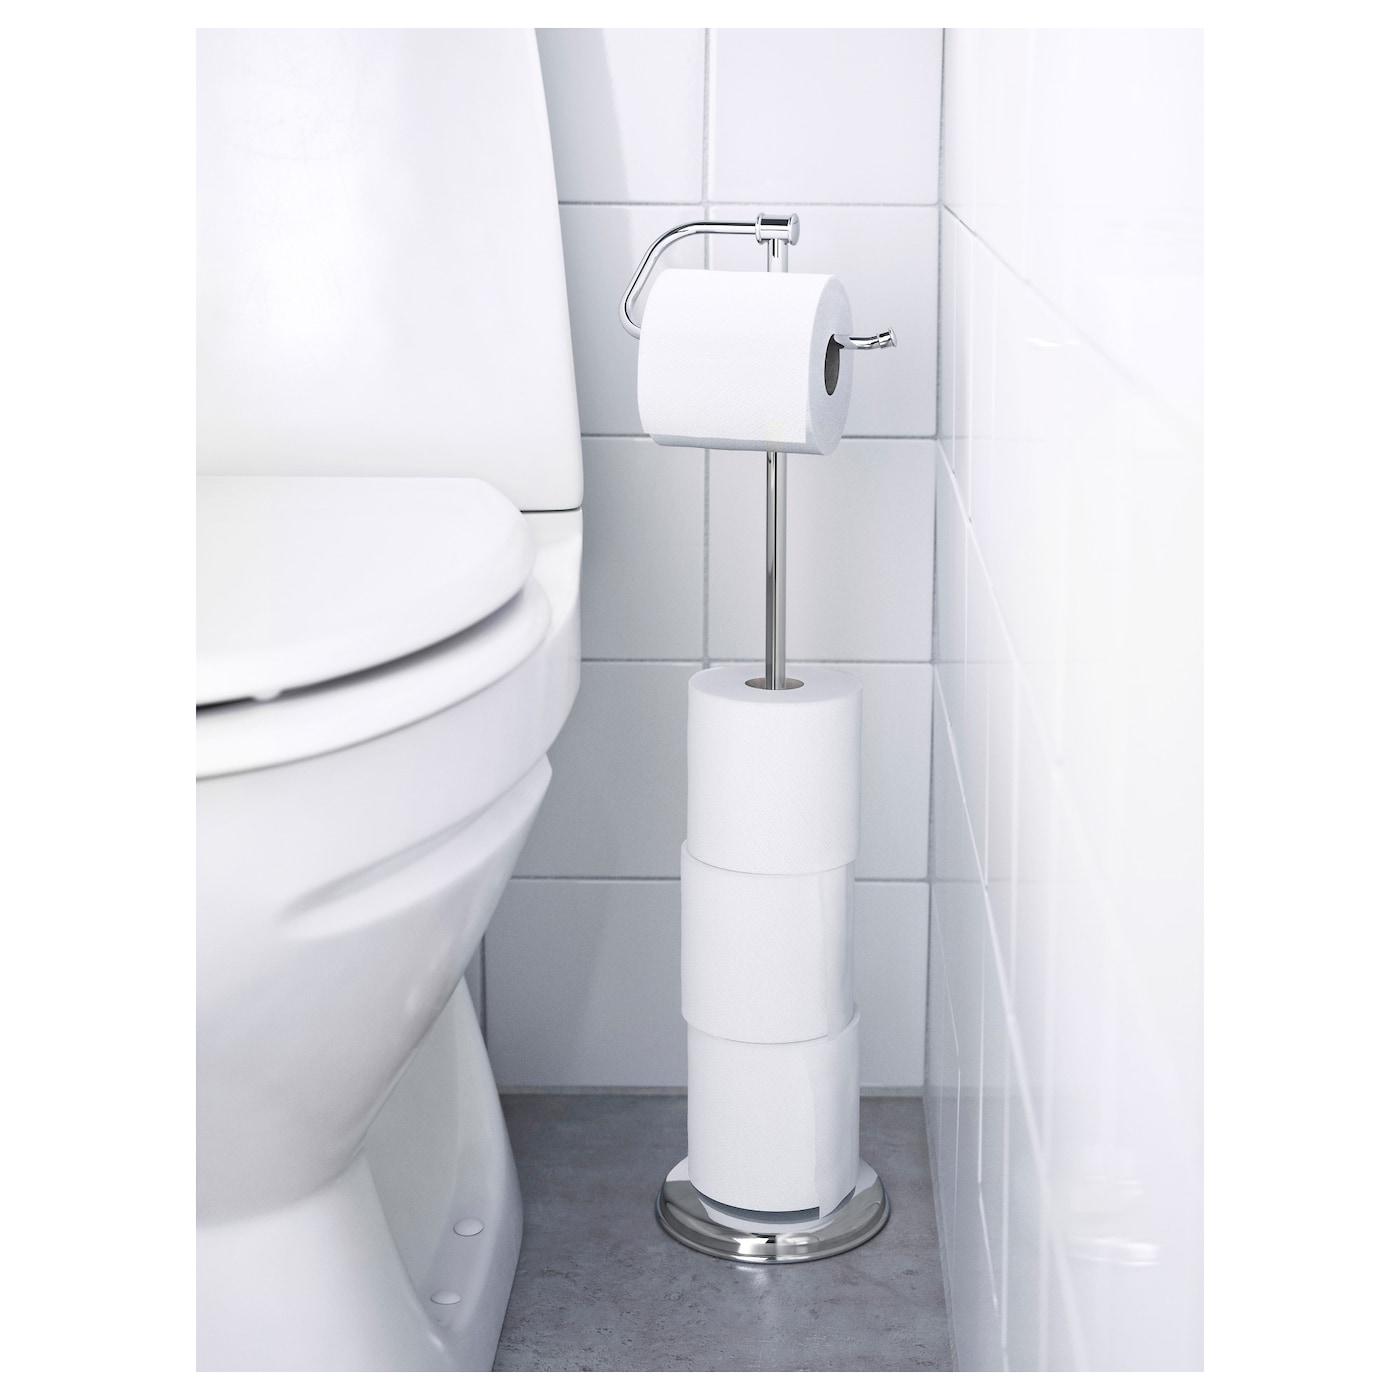 IKEA BALUNGEN toilet roll holder No visible